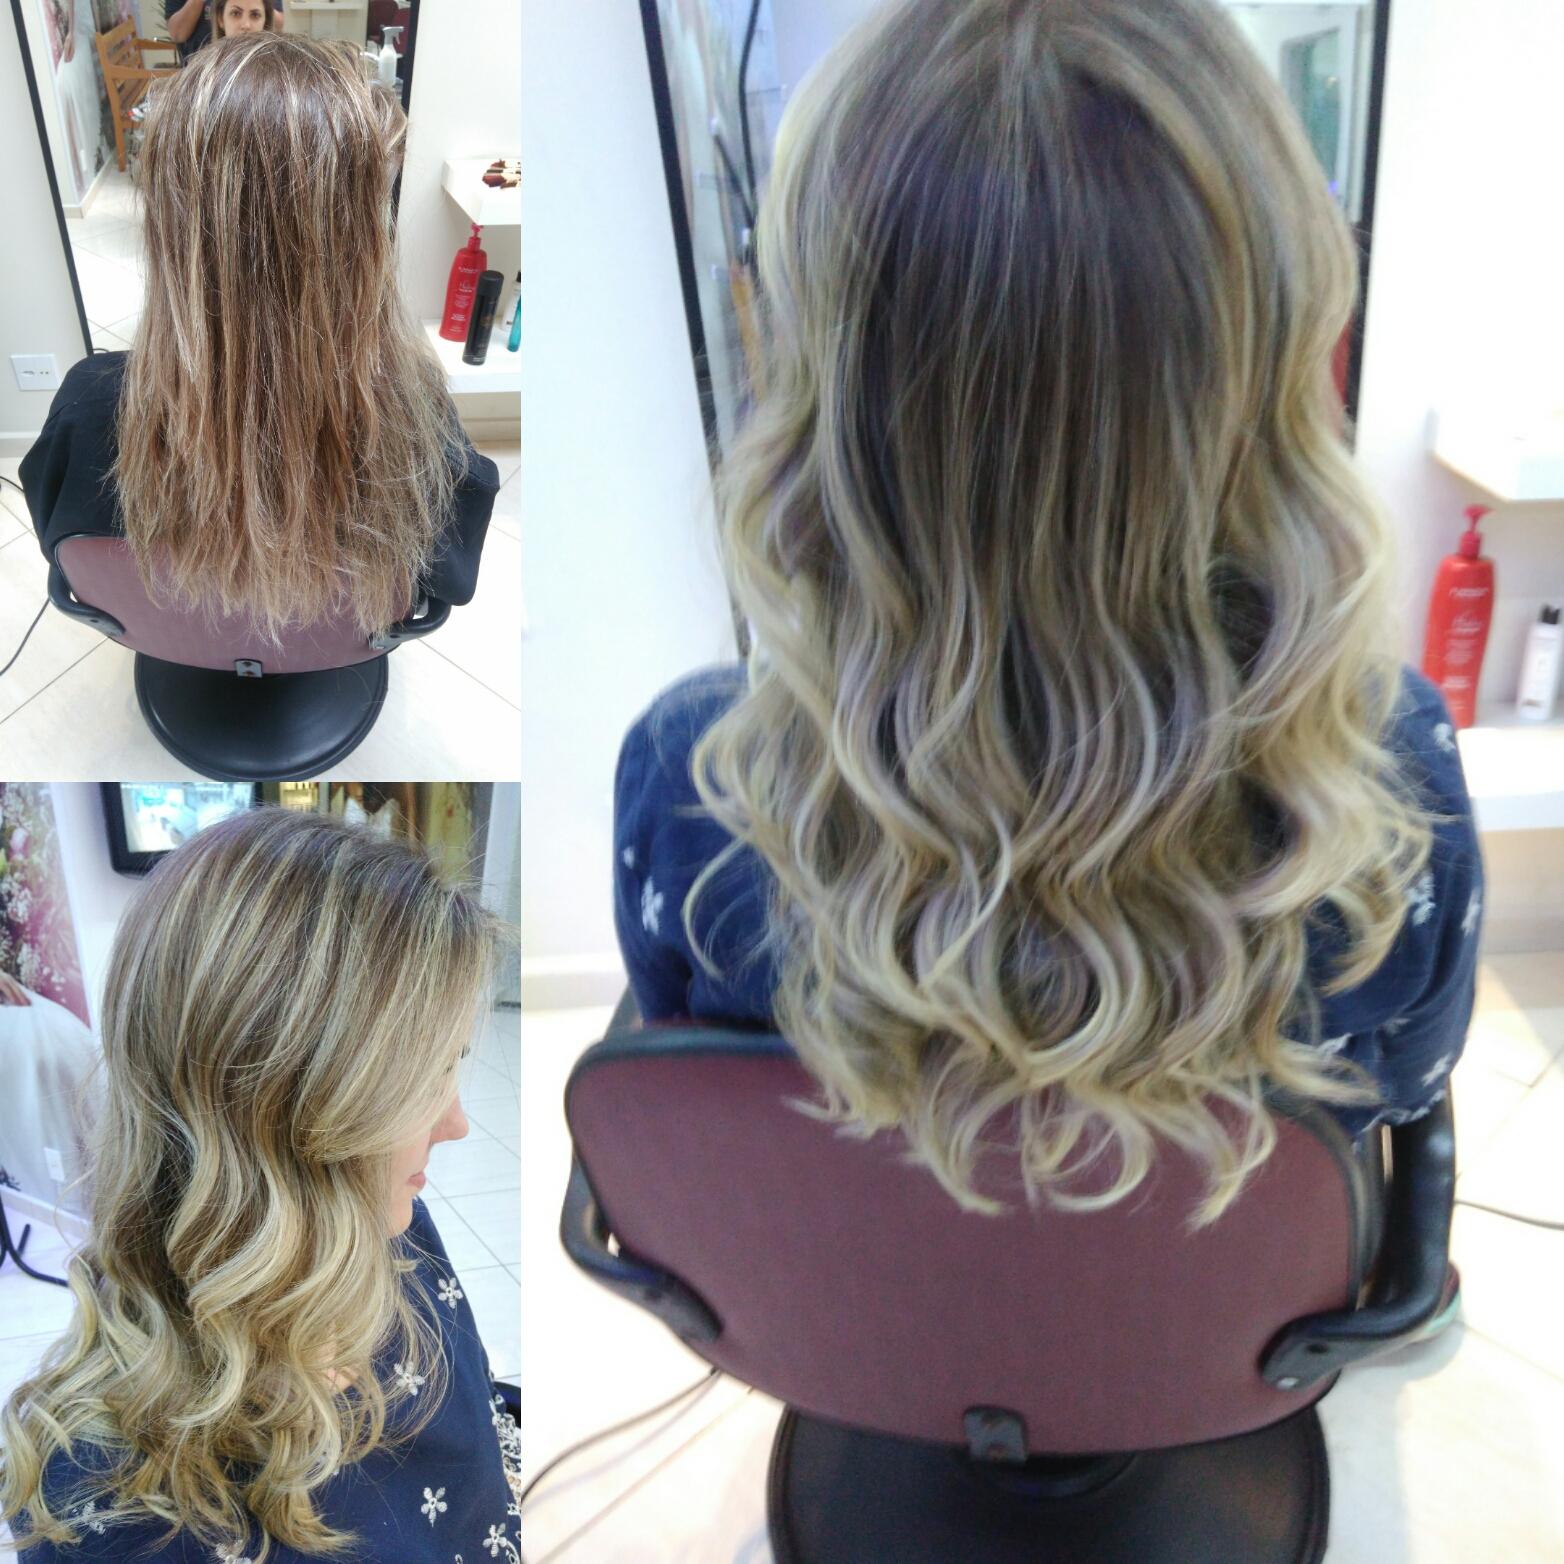 Luzes e escova ondulada  cabelo auxiliar cabeleireiro(a)